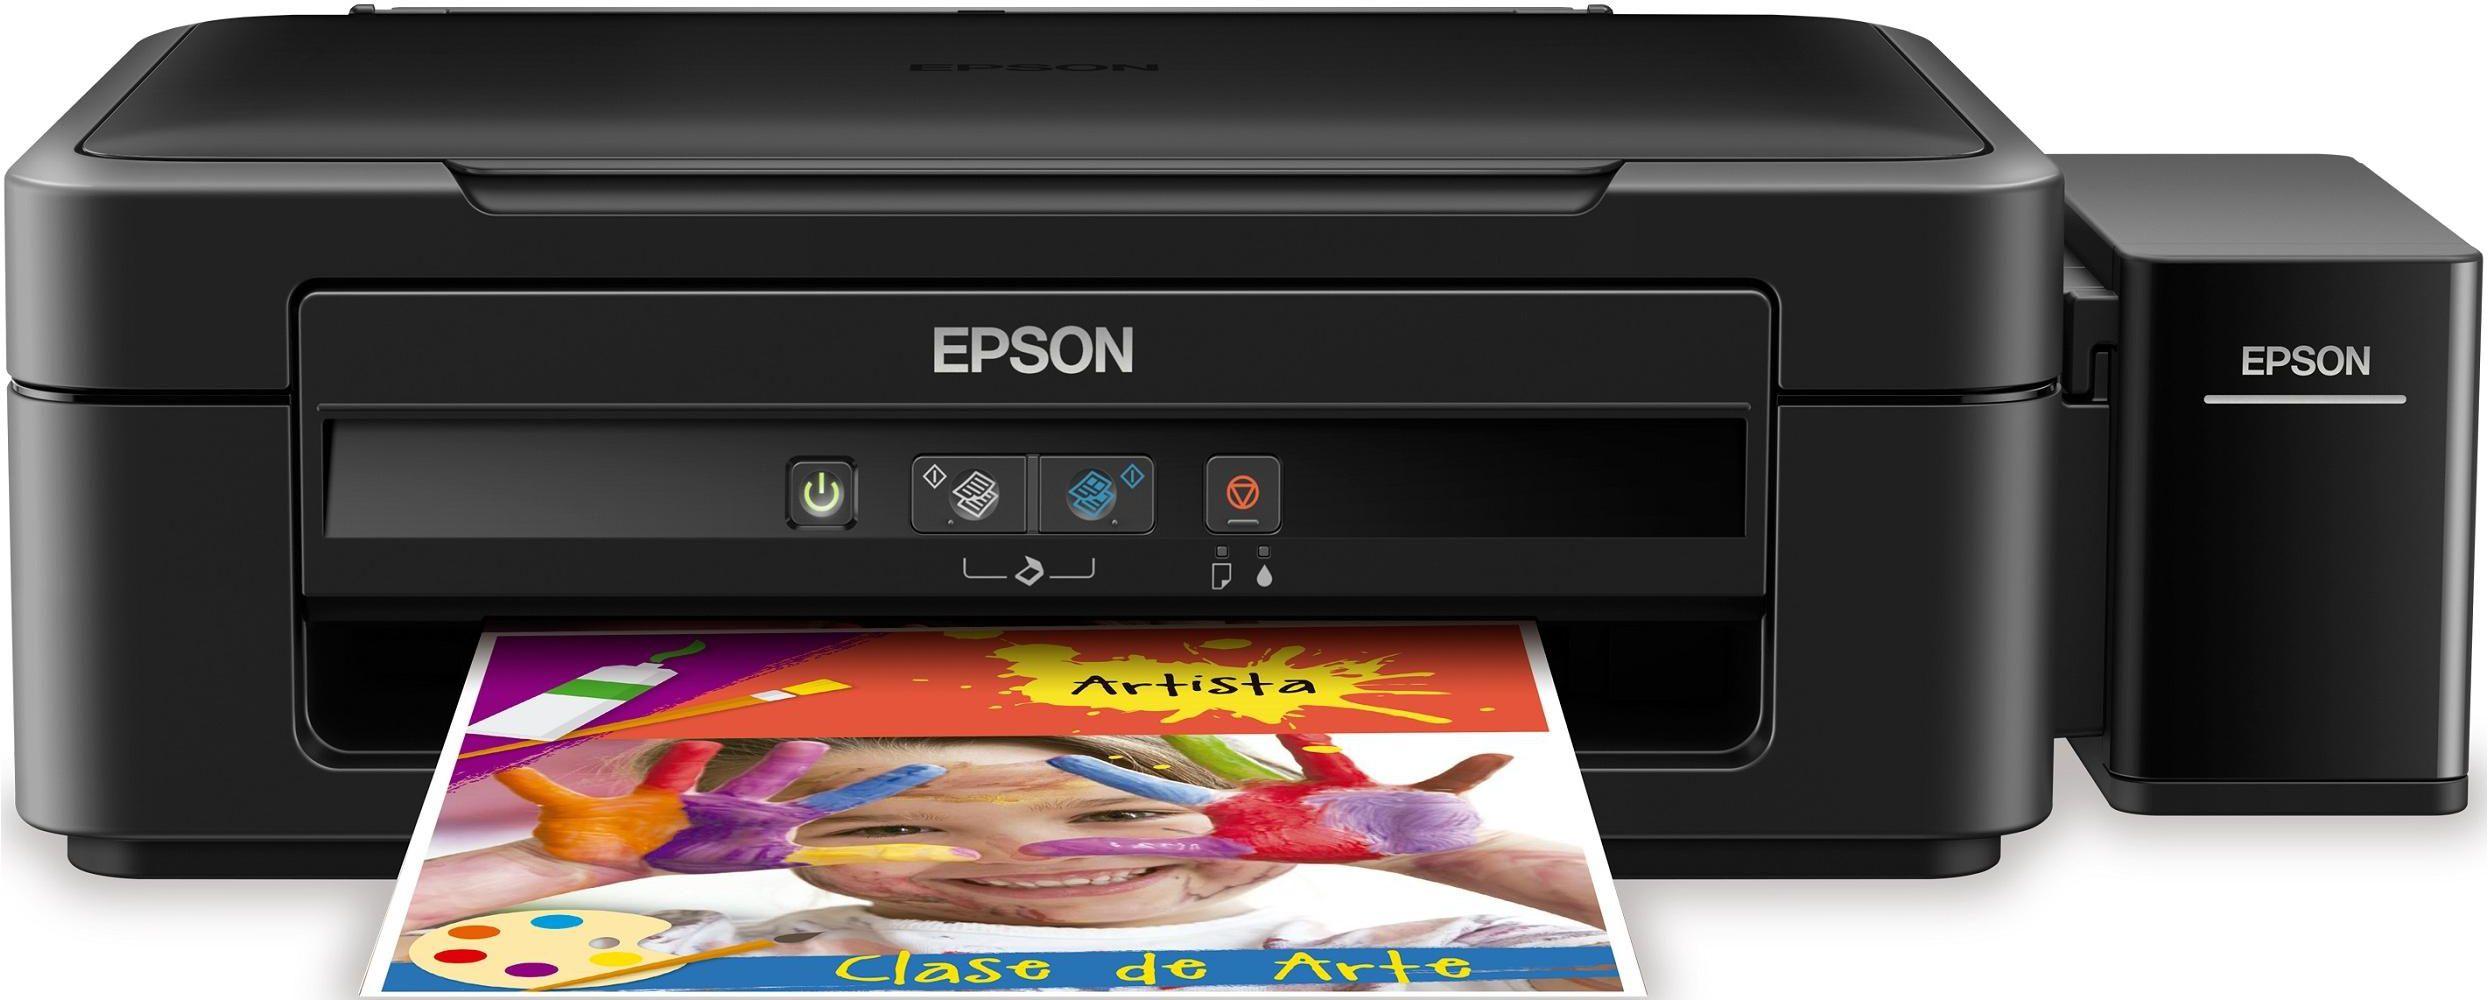 Descargar Epson Scan L220 Driver